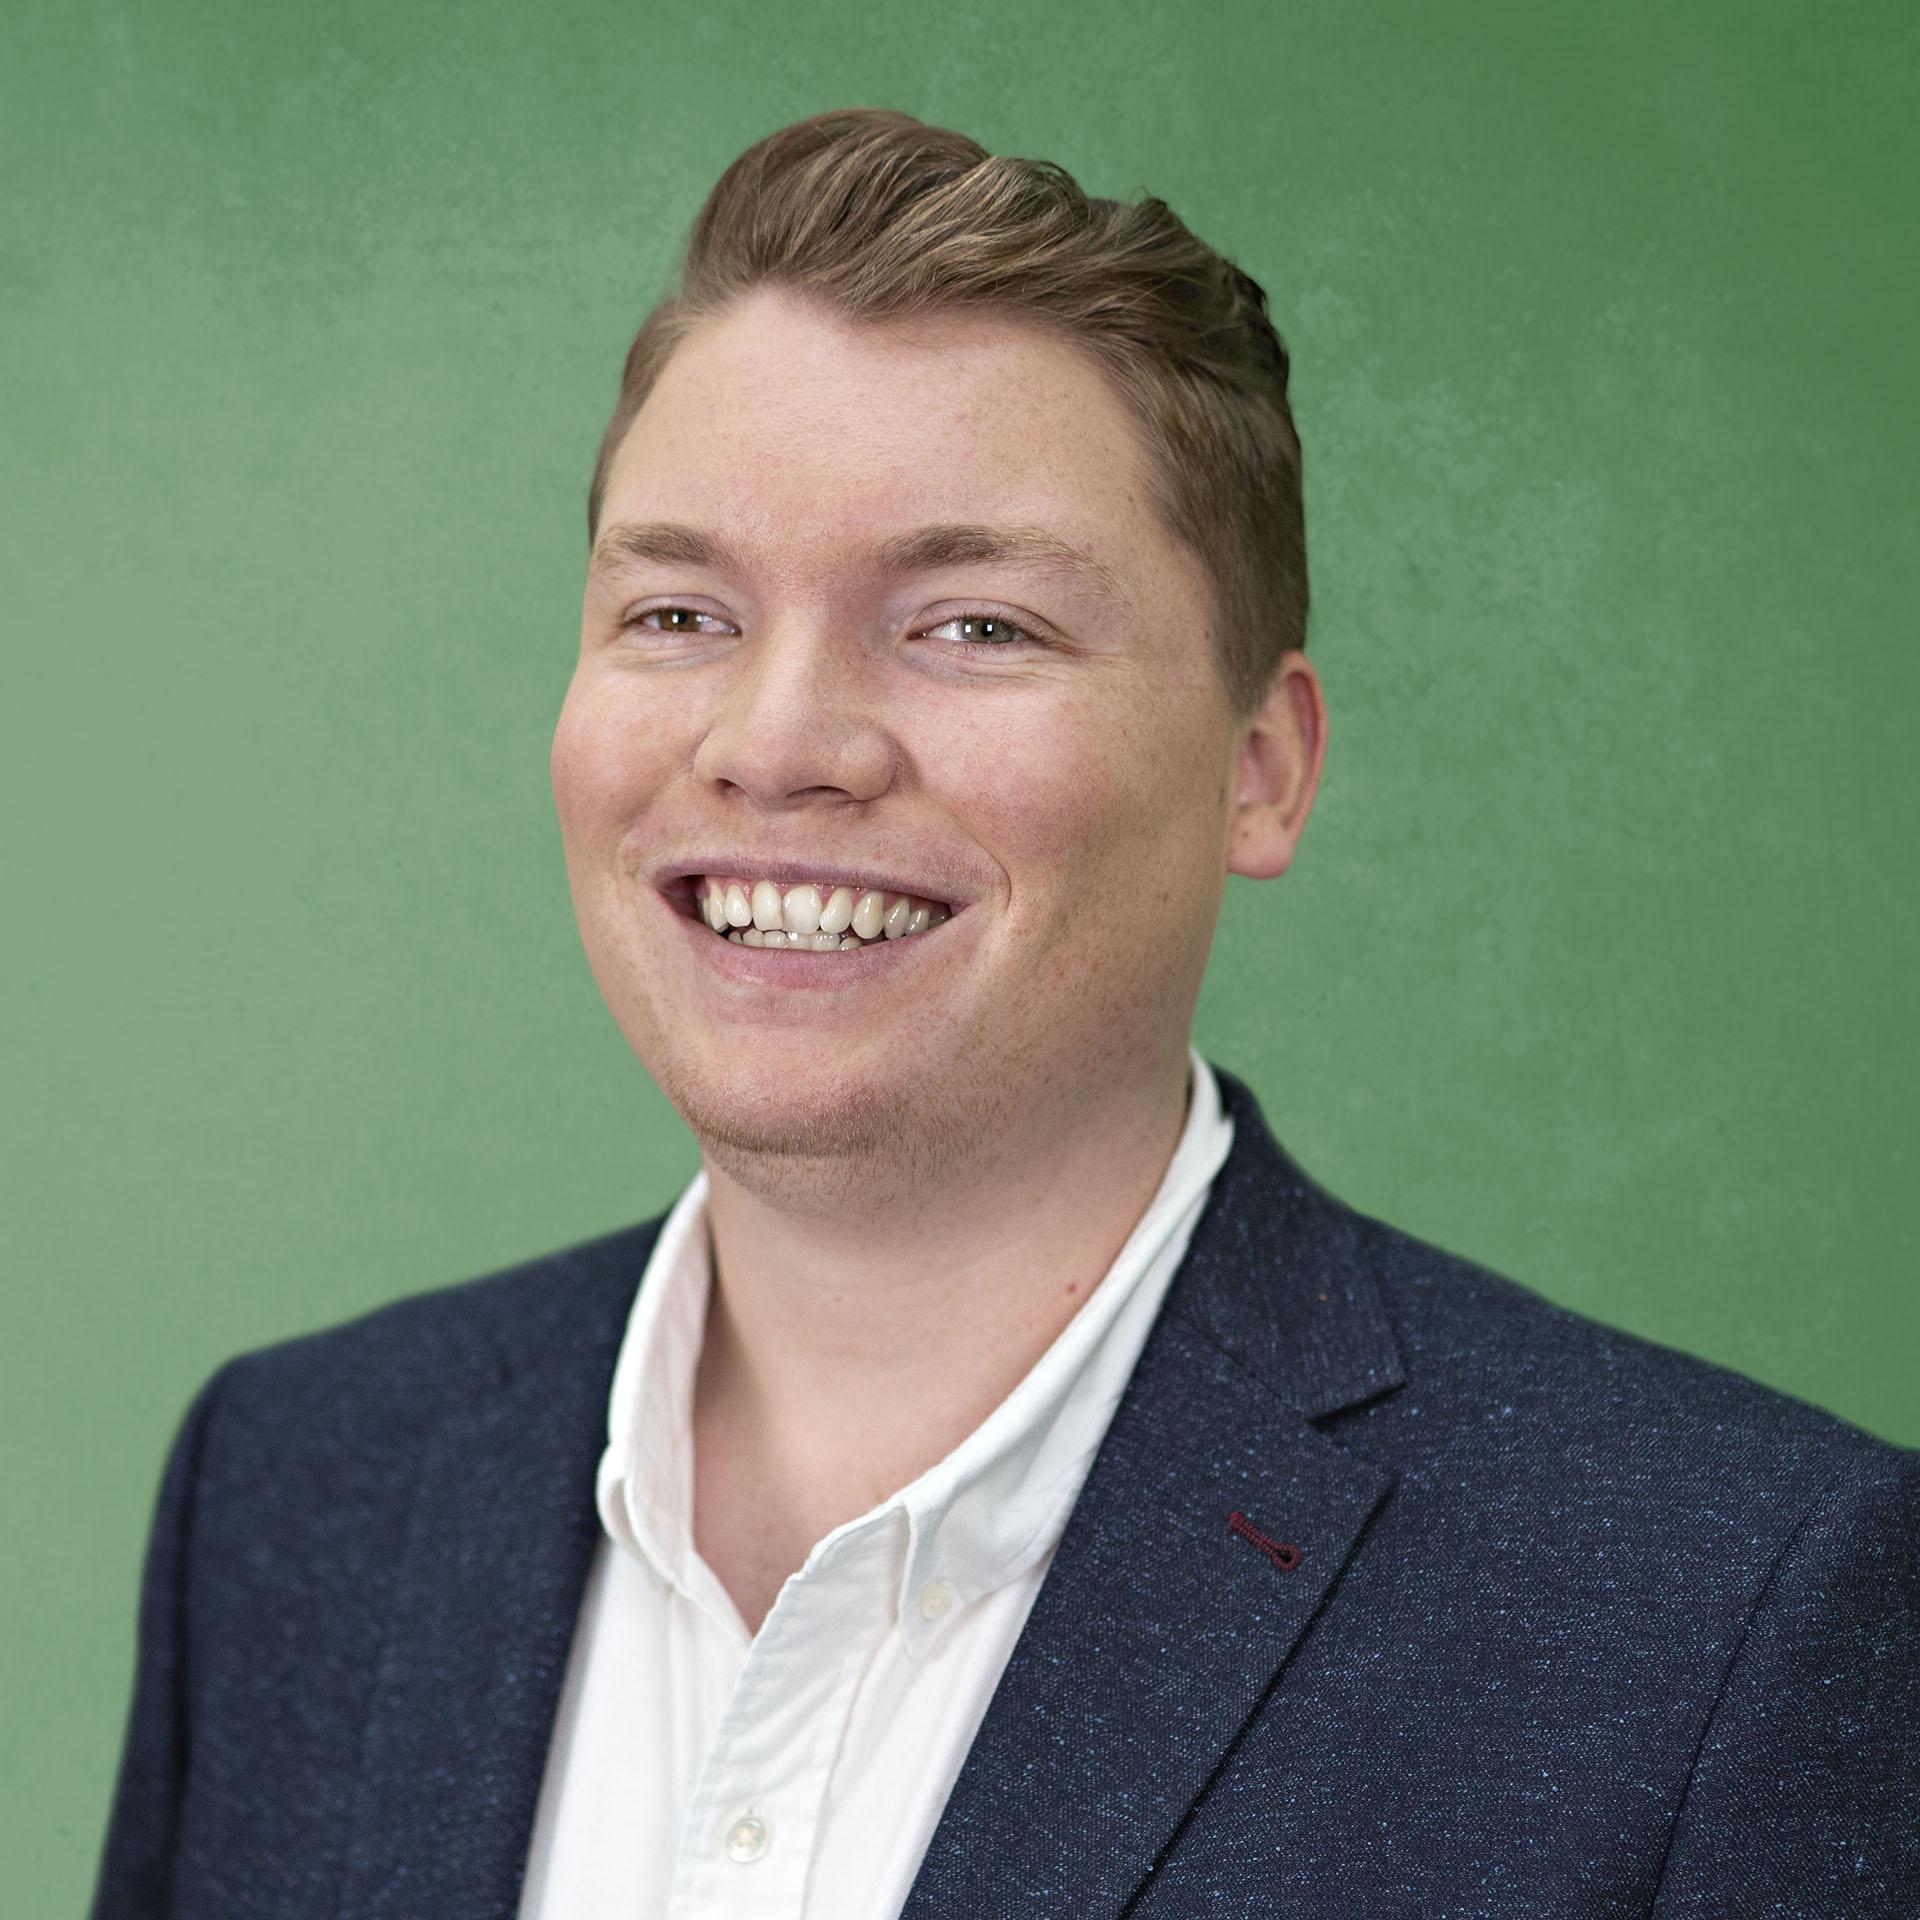 Landtagskandidat 2021